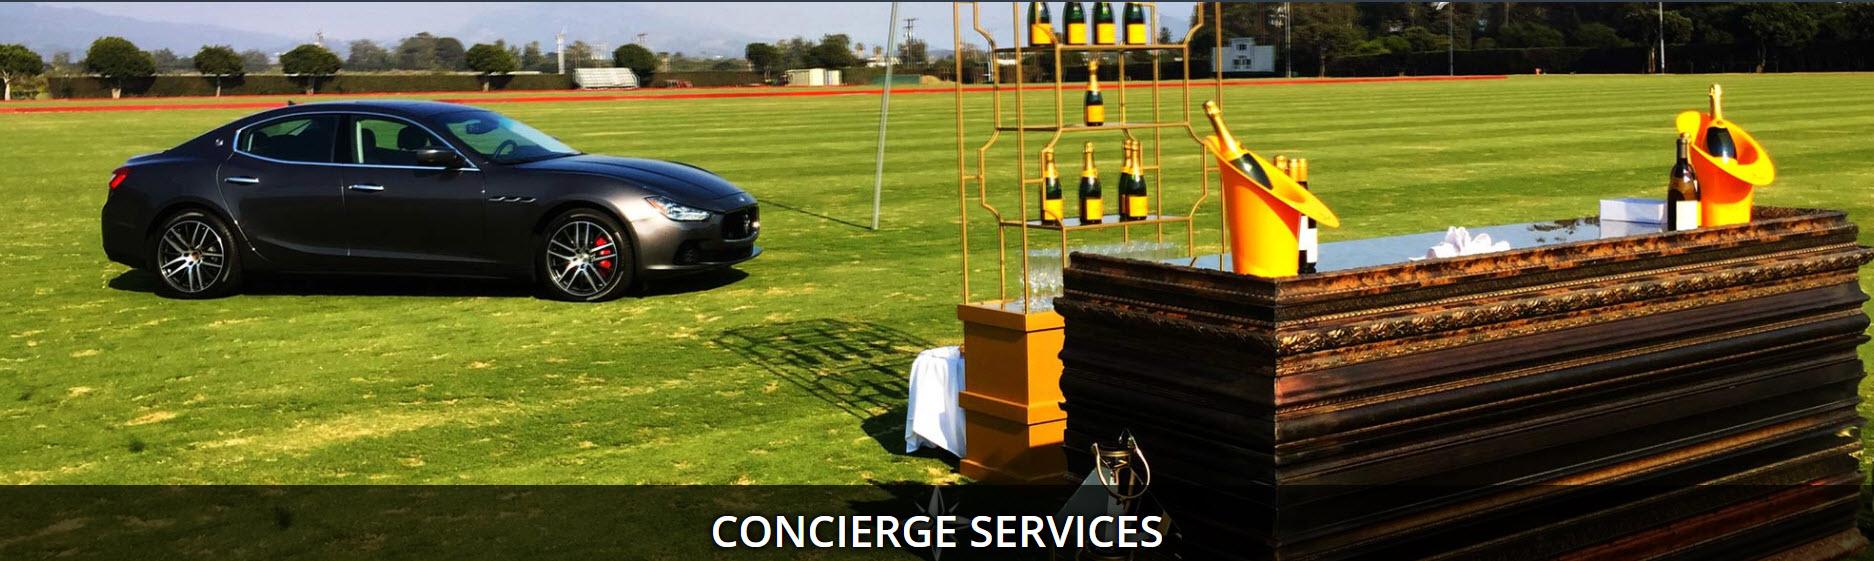 BlueStar Parking image 9